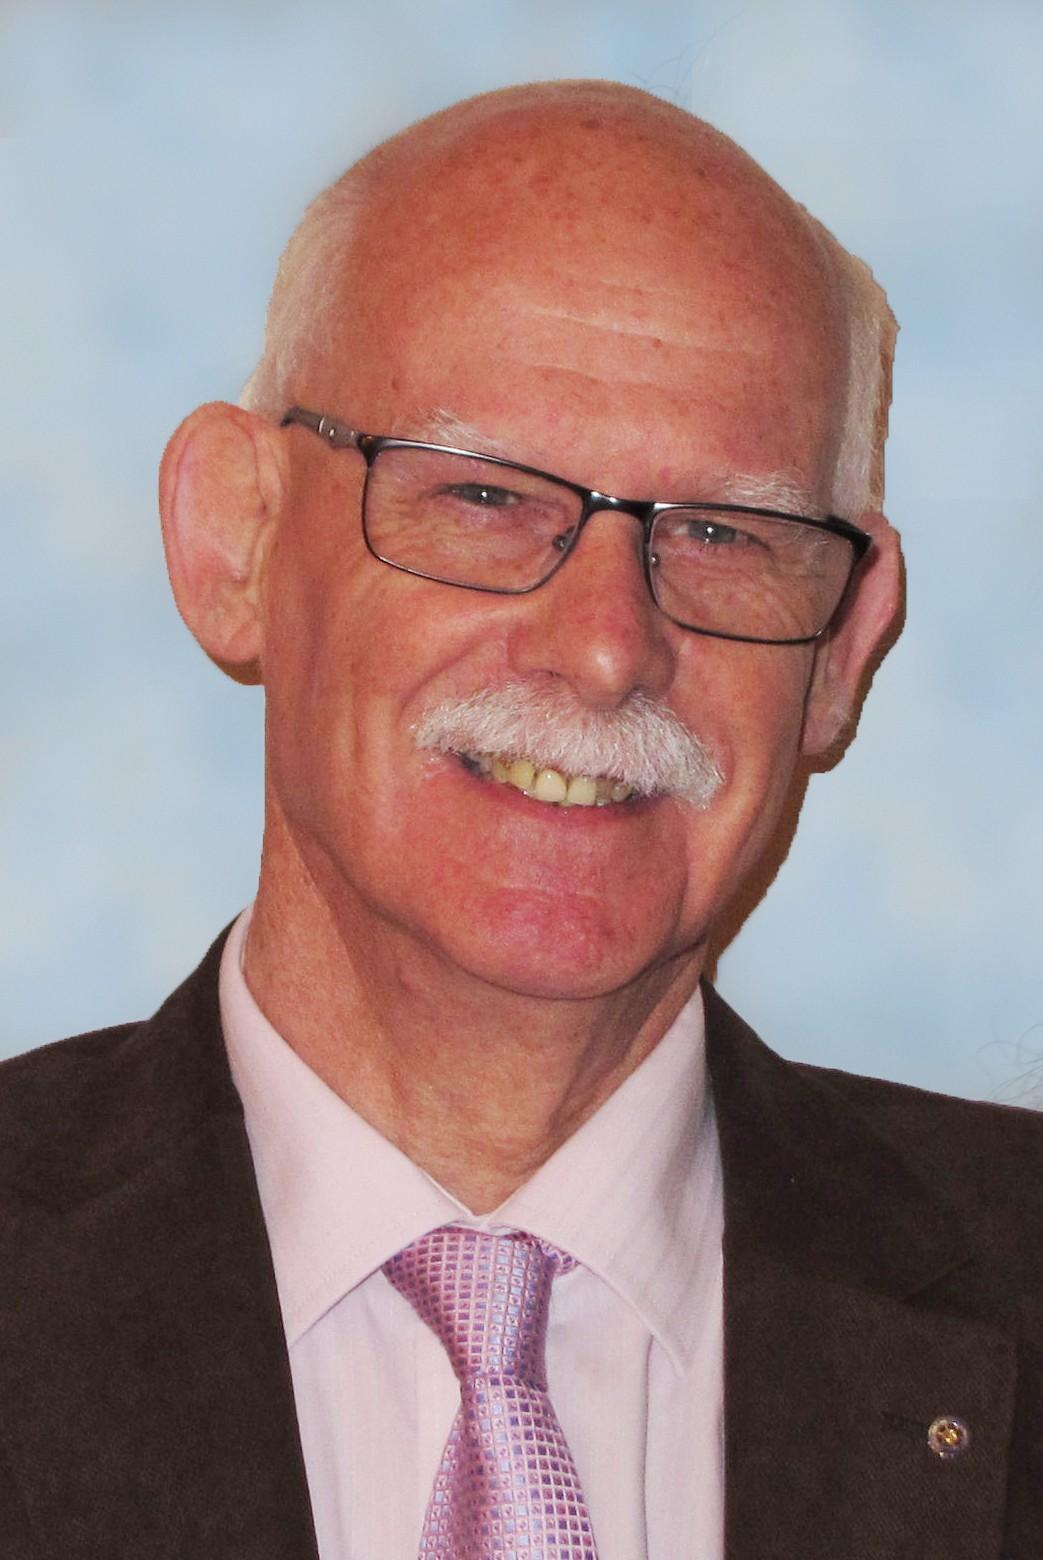 Vice President Paul Gardiner